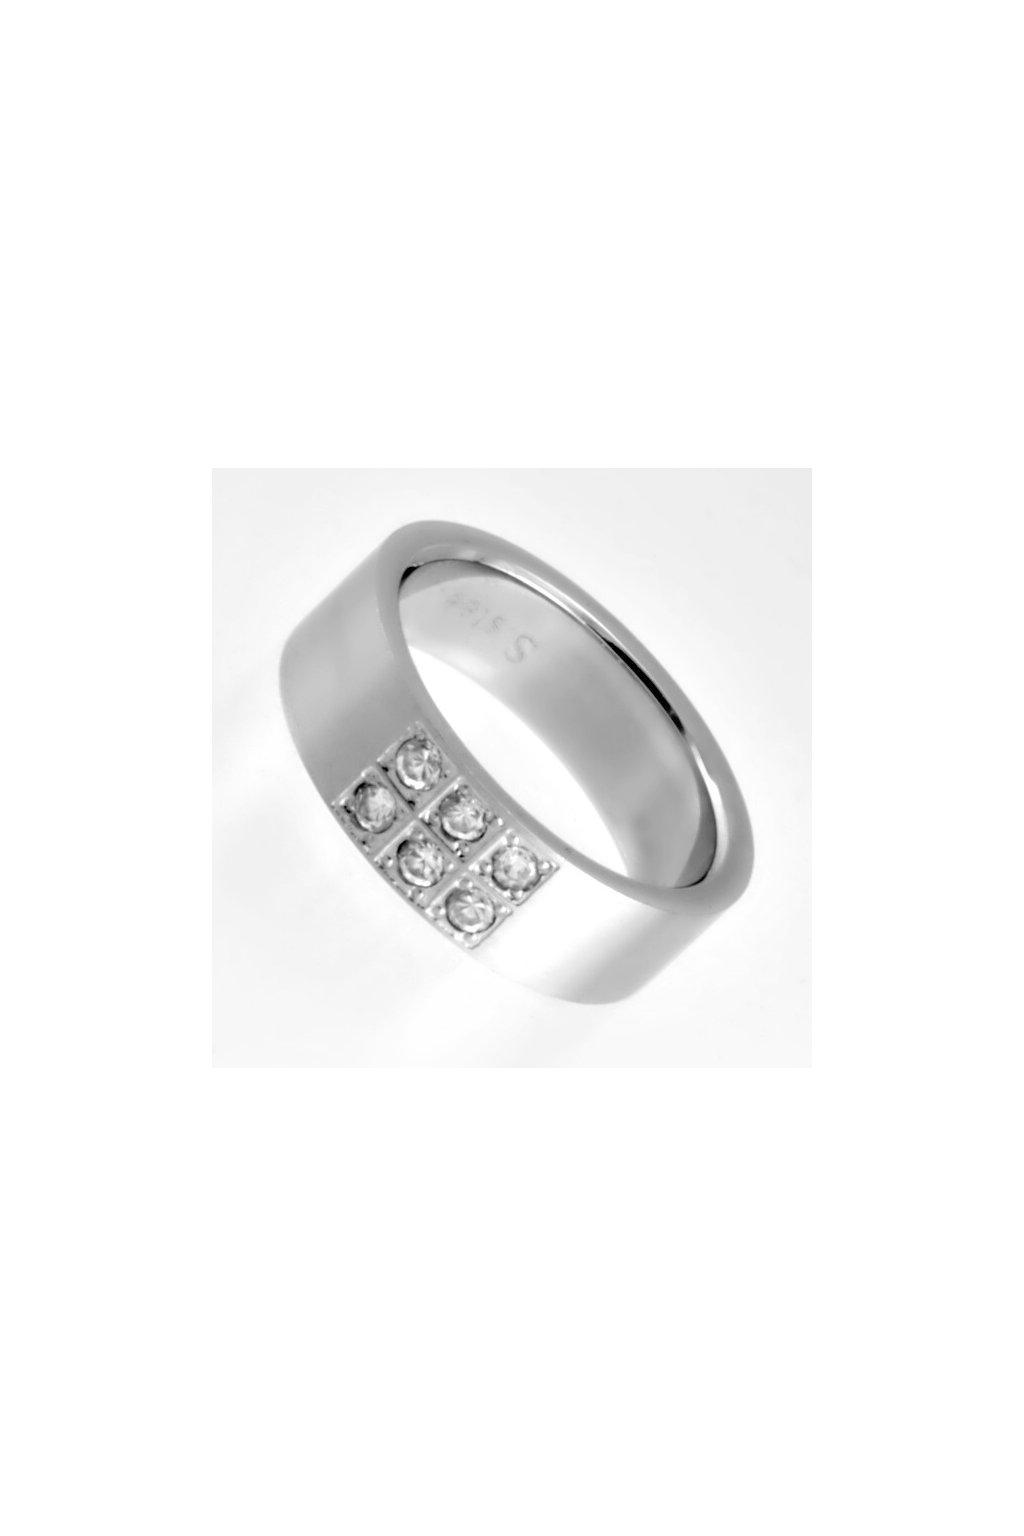 Skalimar Prsten z chirurgické oceli S KAMÍNKY 212100